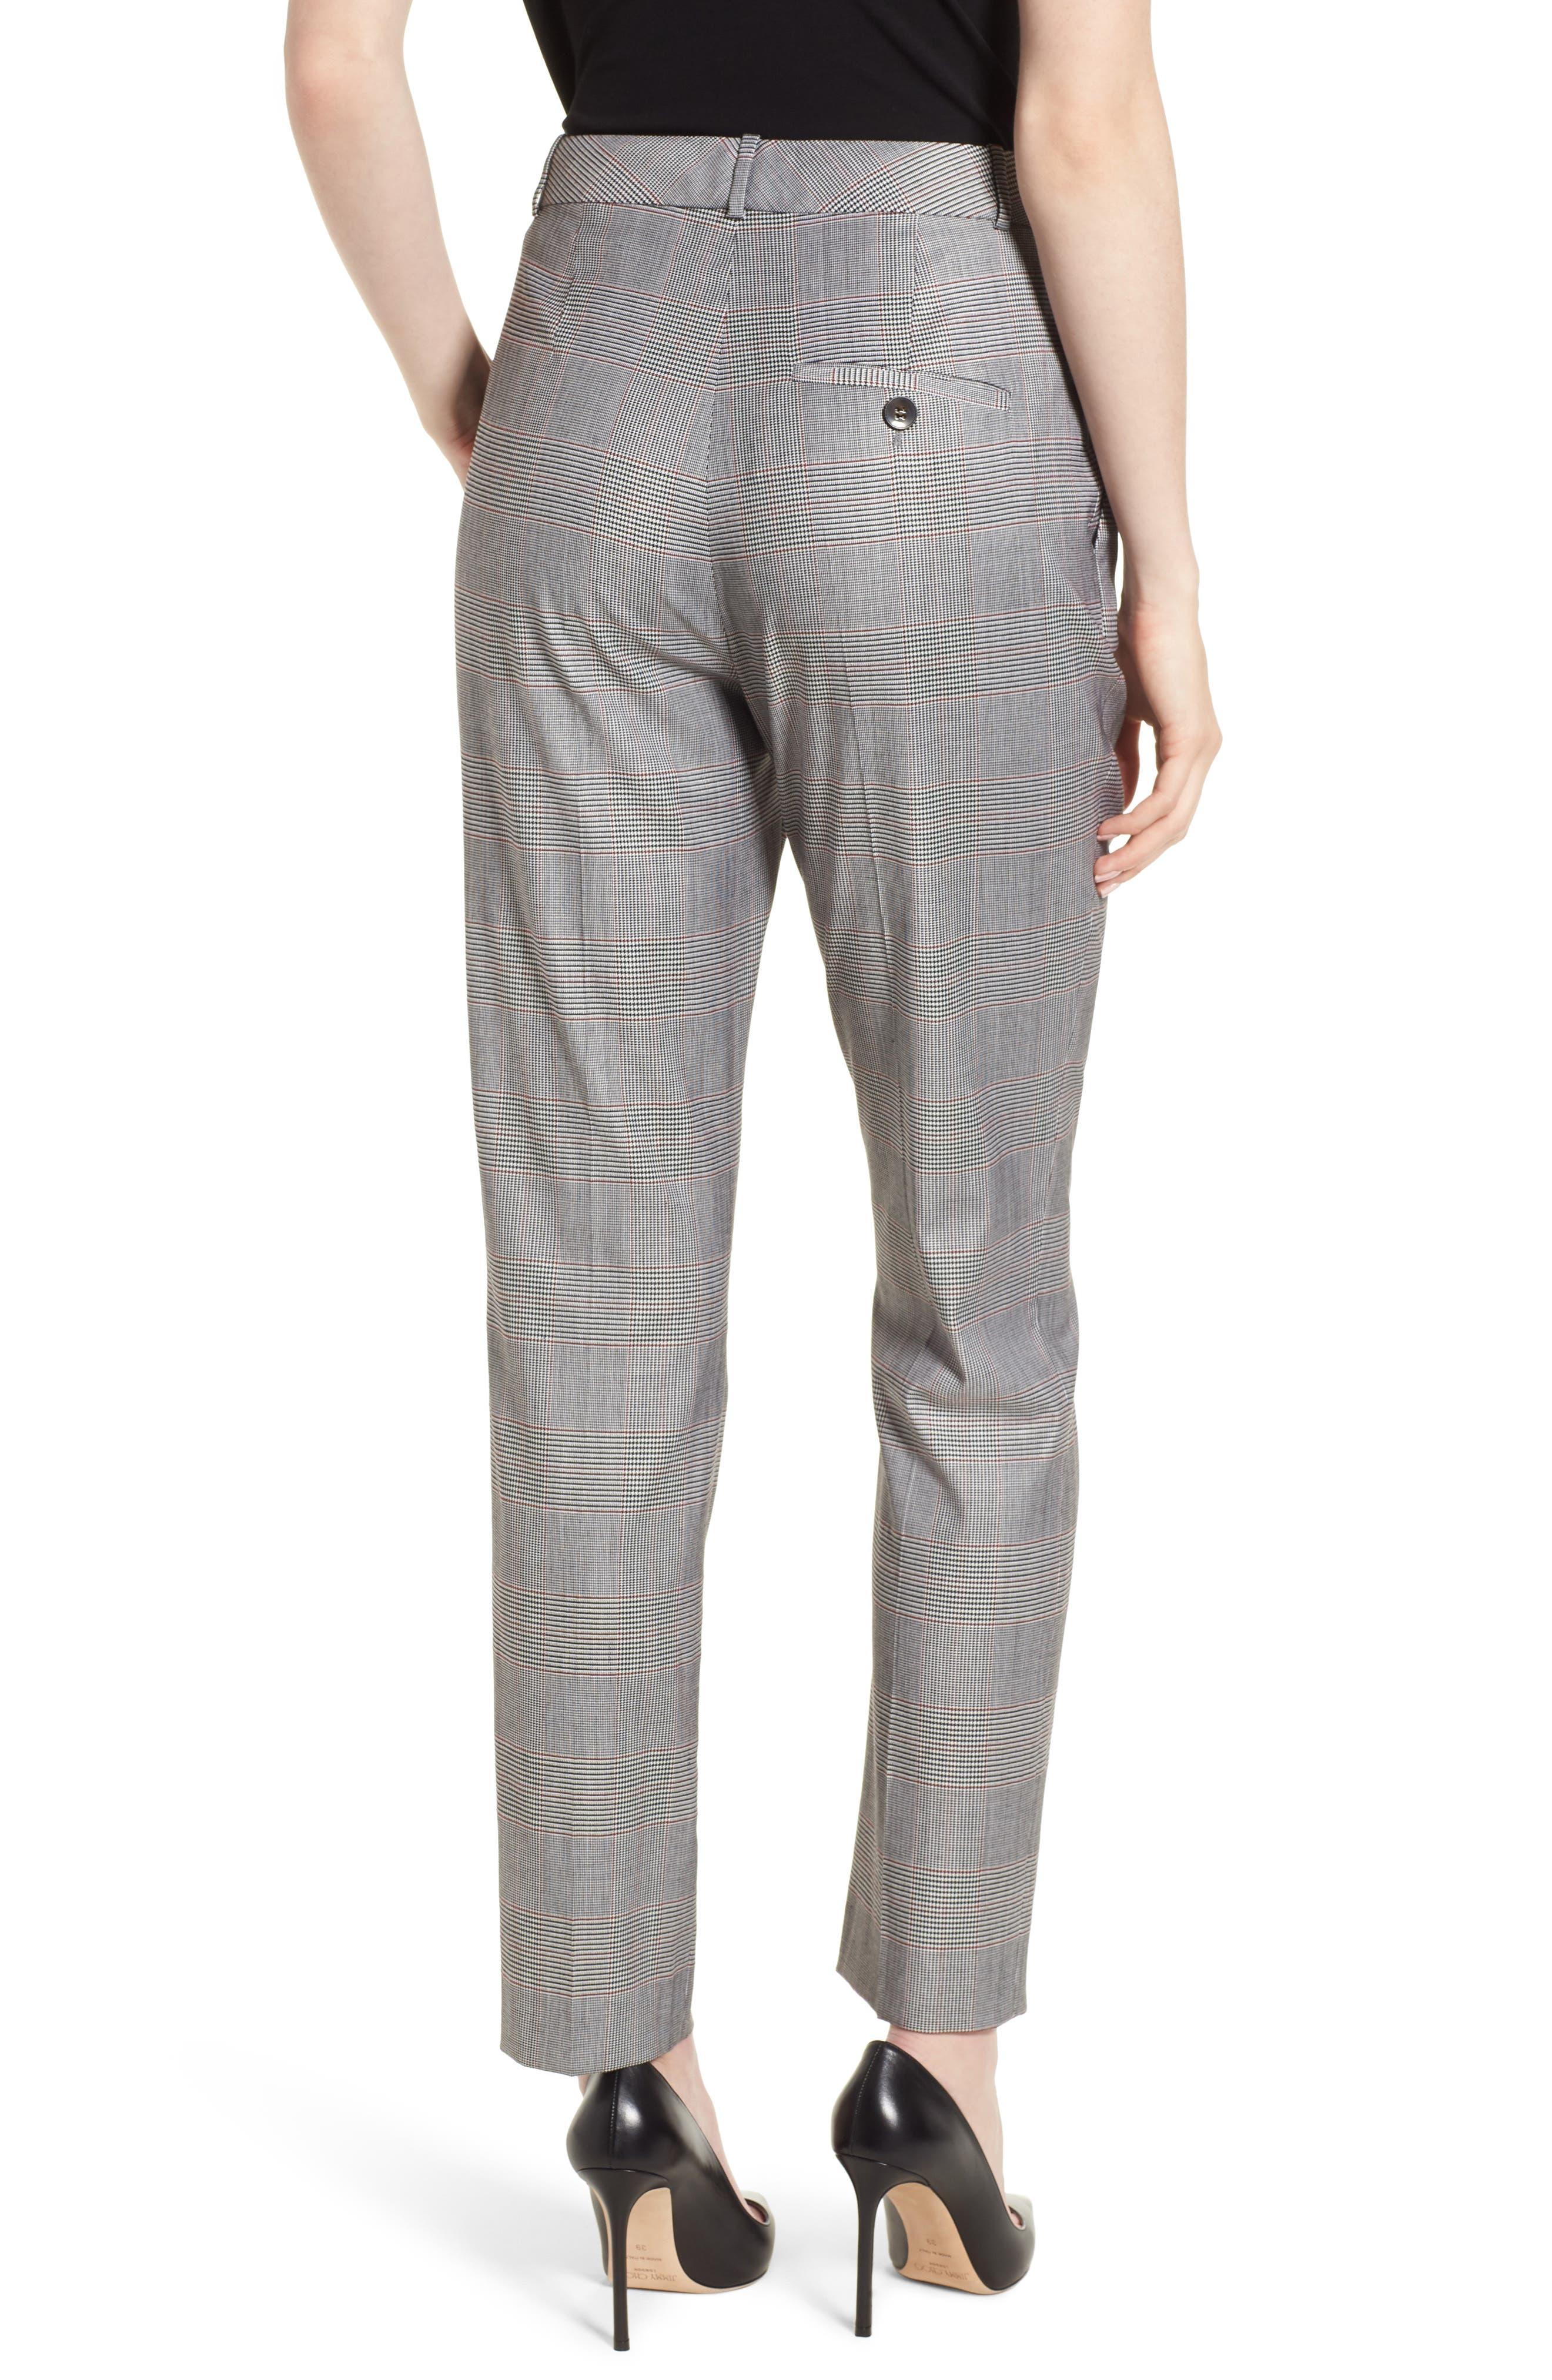 Tofilia Glencheck Slim Fit Trousers,                             Alternate thumbnail 2, color,                             Dark Sunset Orange Fantasy